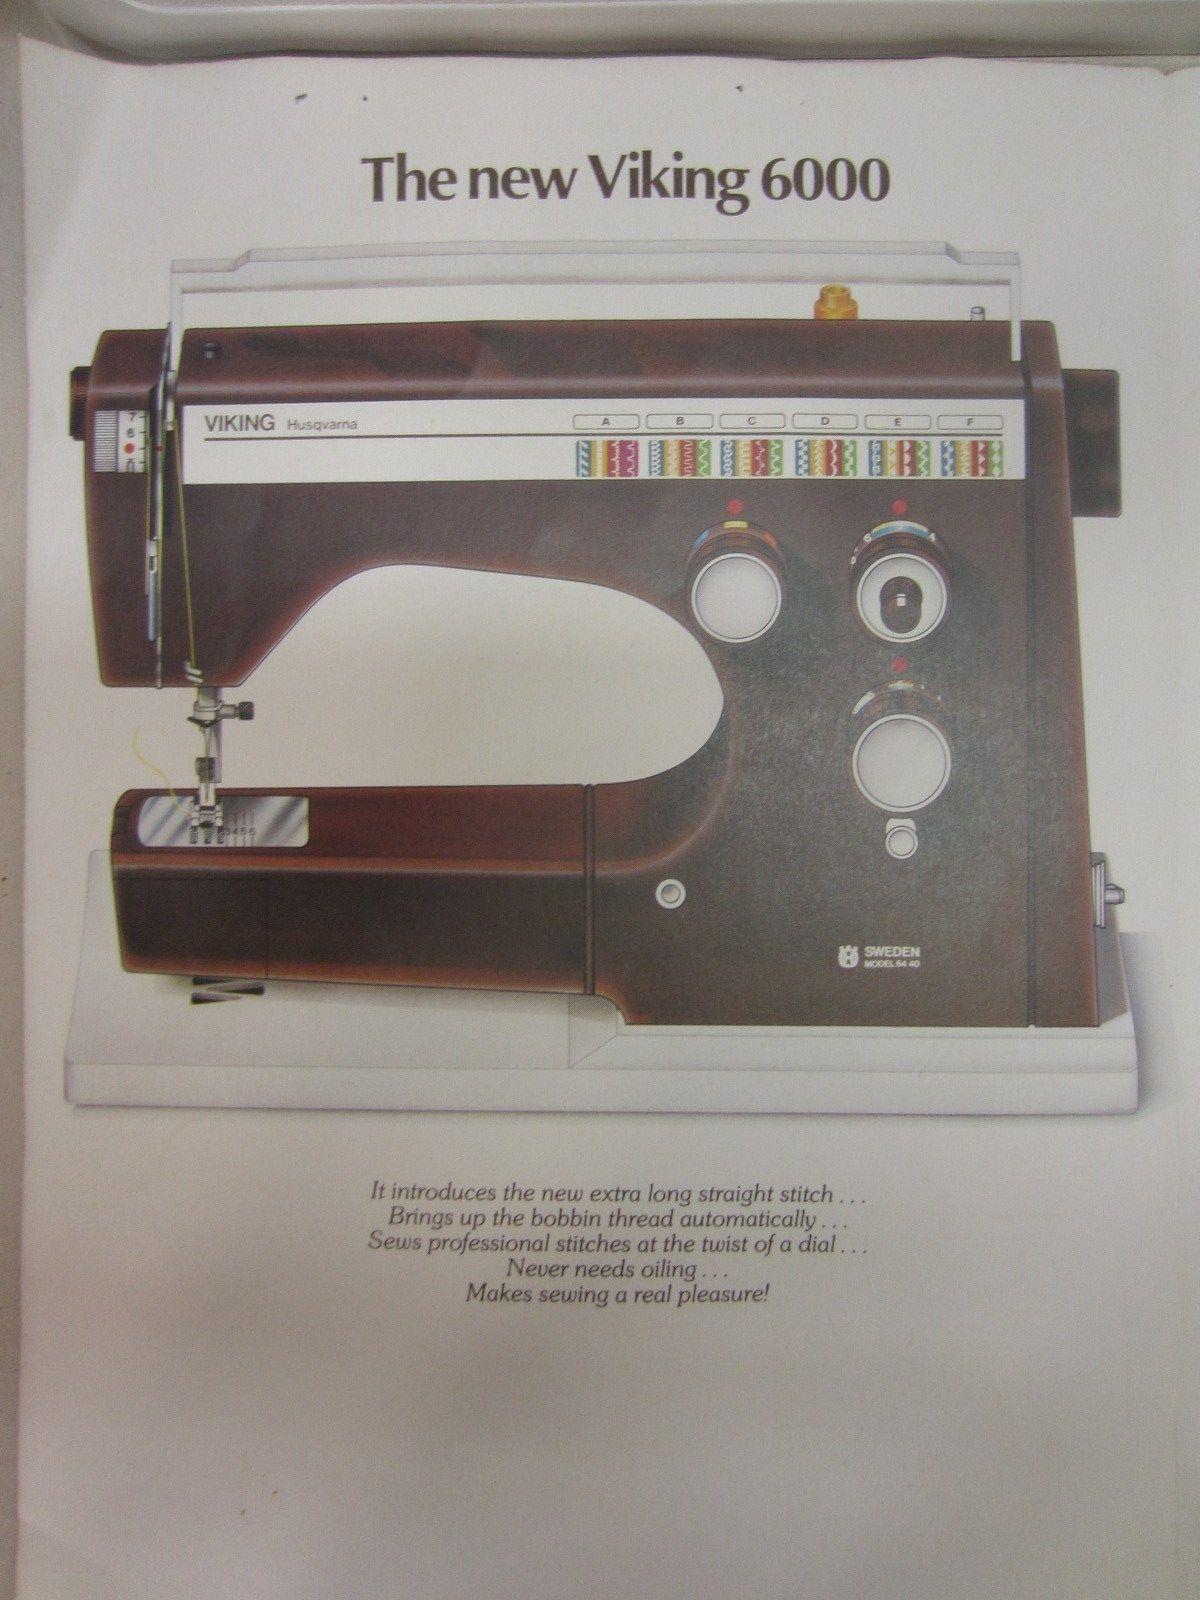 vintage sewing machines viking husqvarna sewing machines rh tumorfarmer blogspot com Husqvarna Viking 400 Sewing Machine Manuals Viking Sewing Machine Dealers